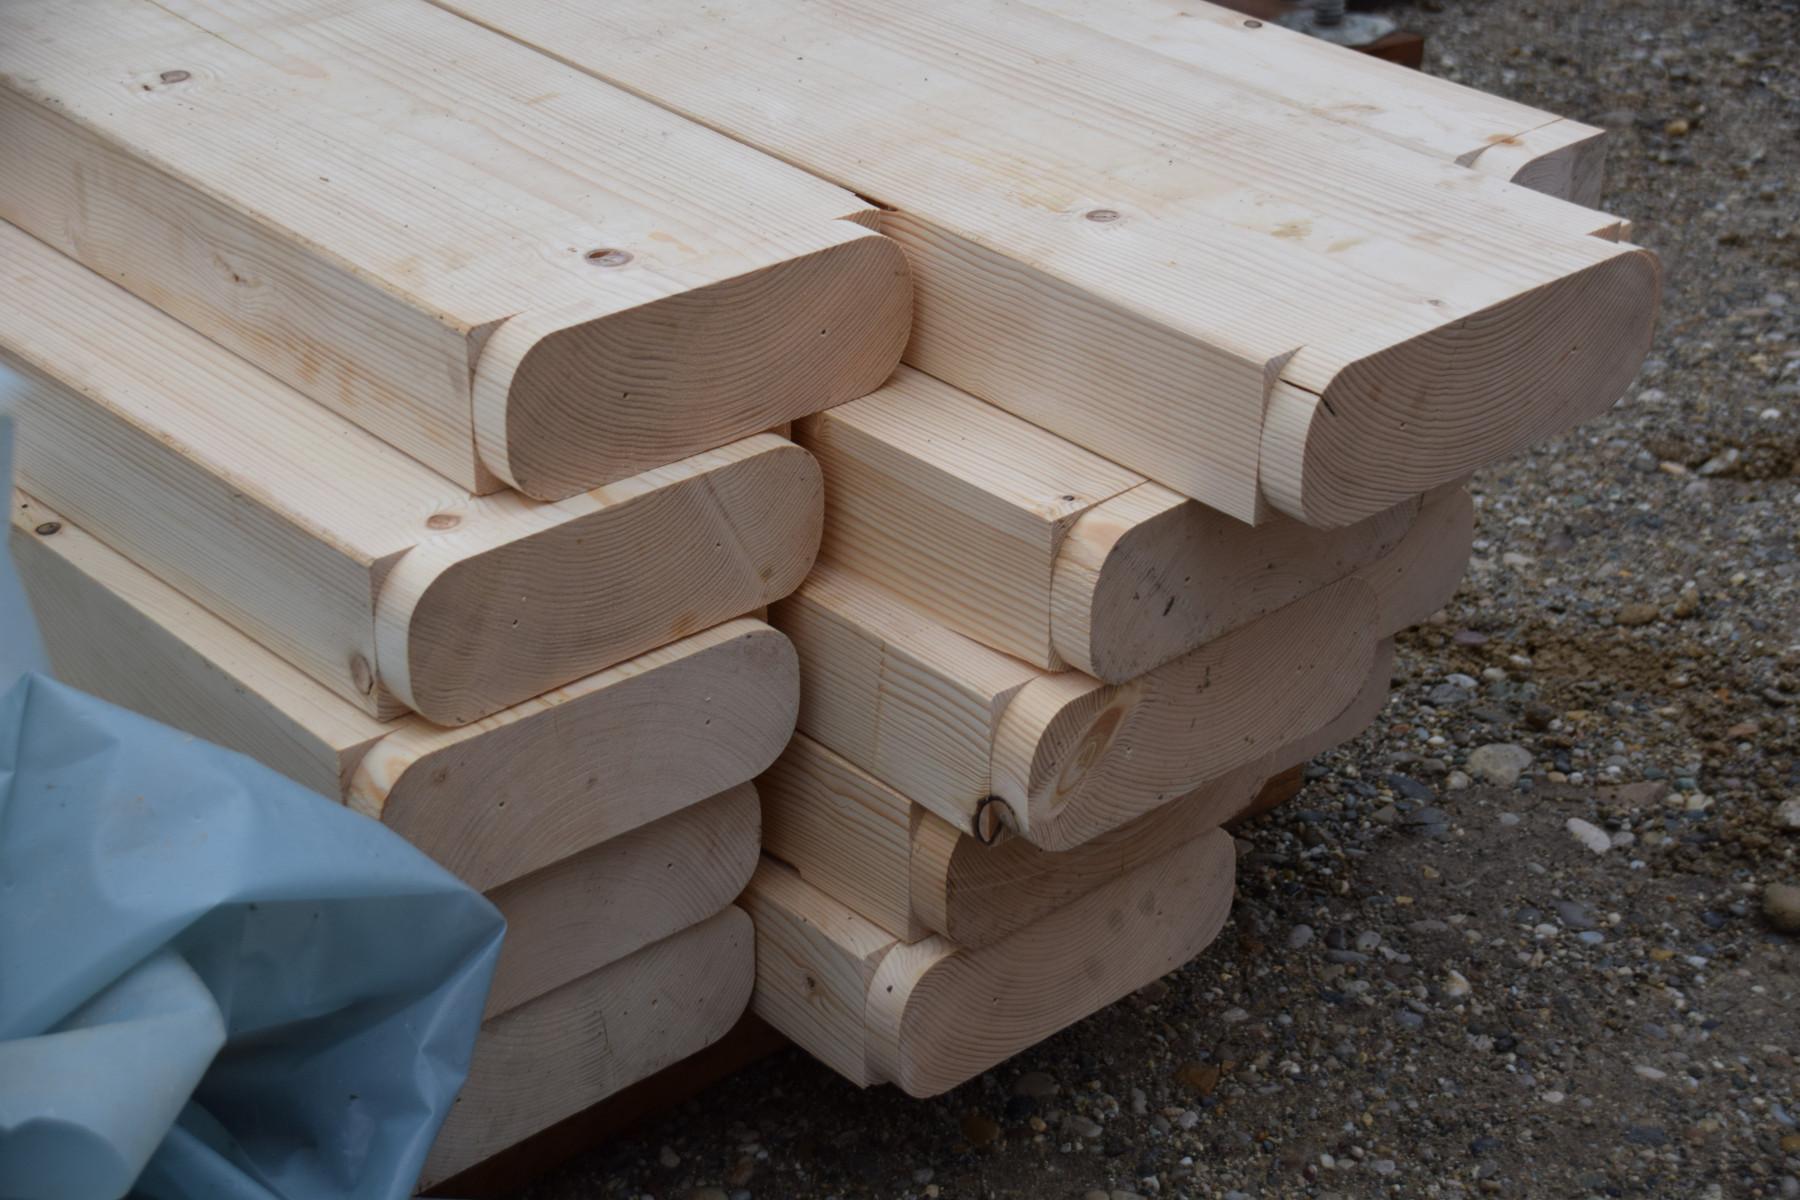 DSC_0391Strasser Holzbau Riedering.jpg